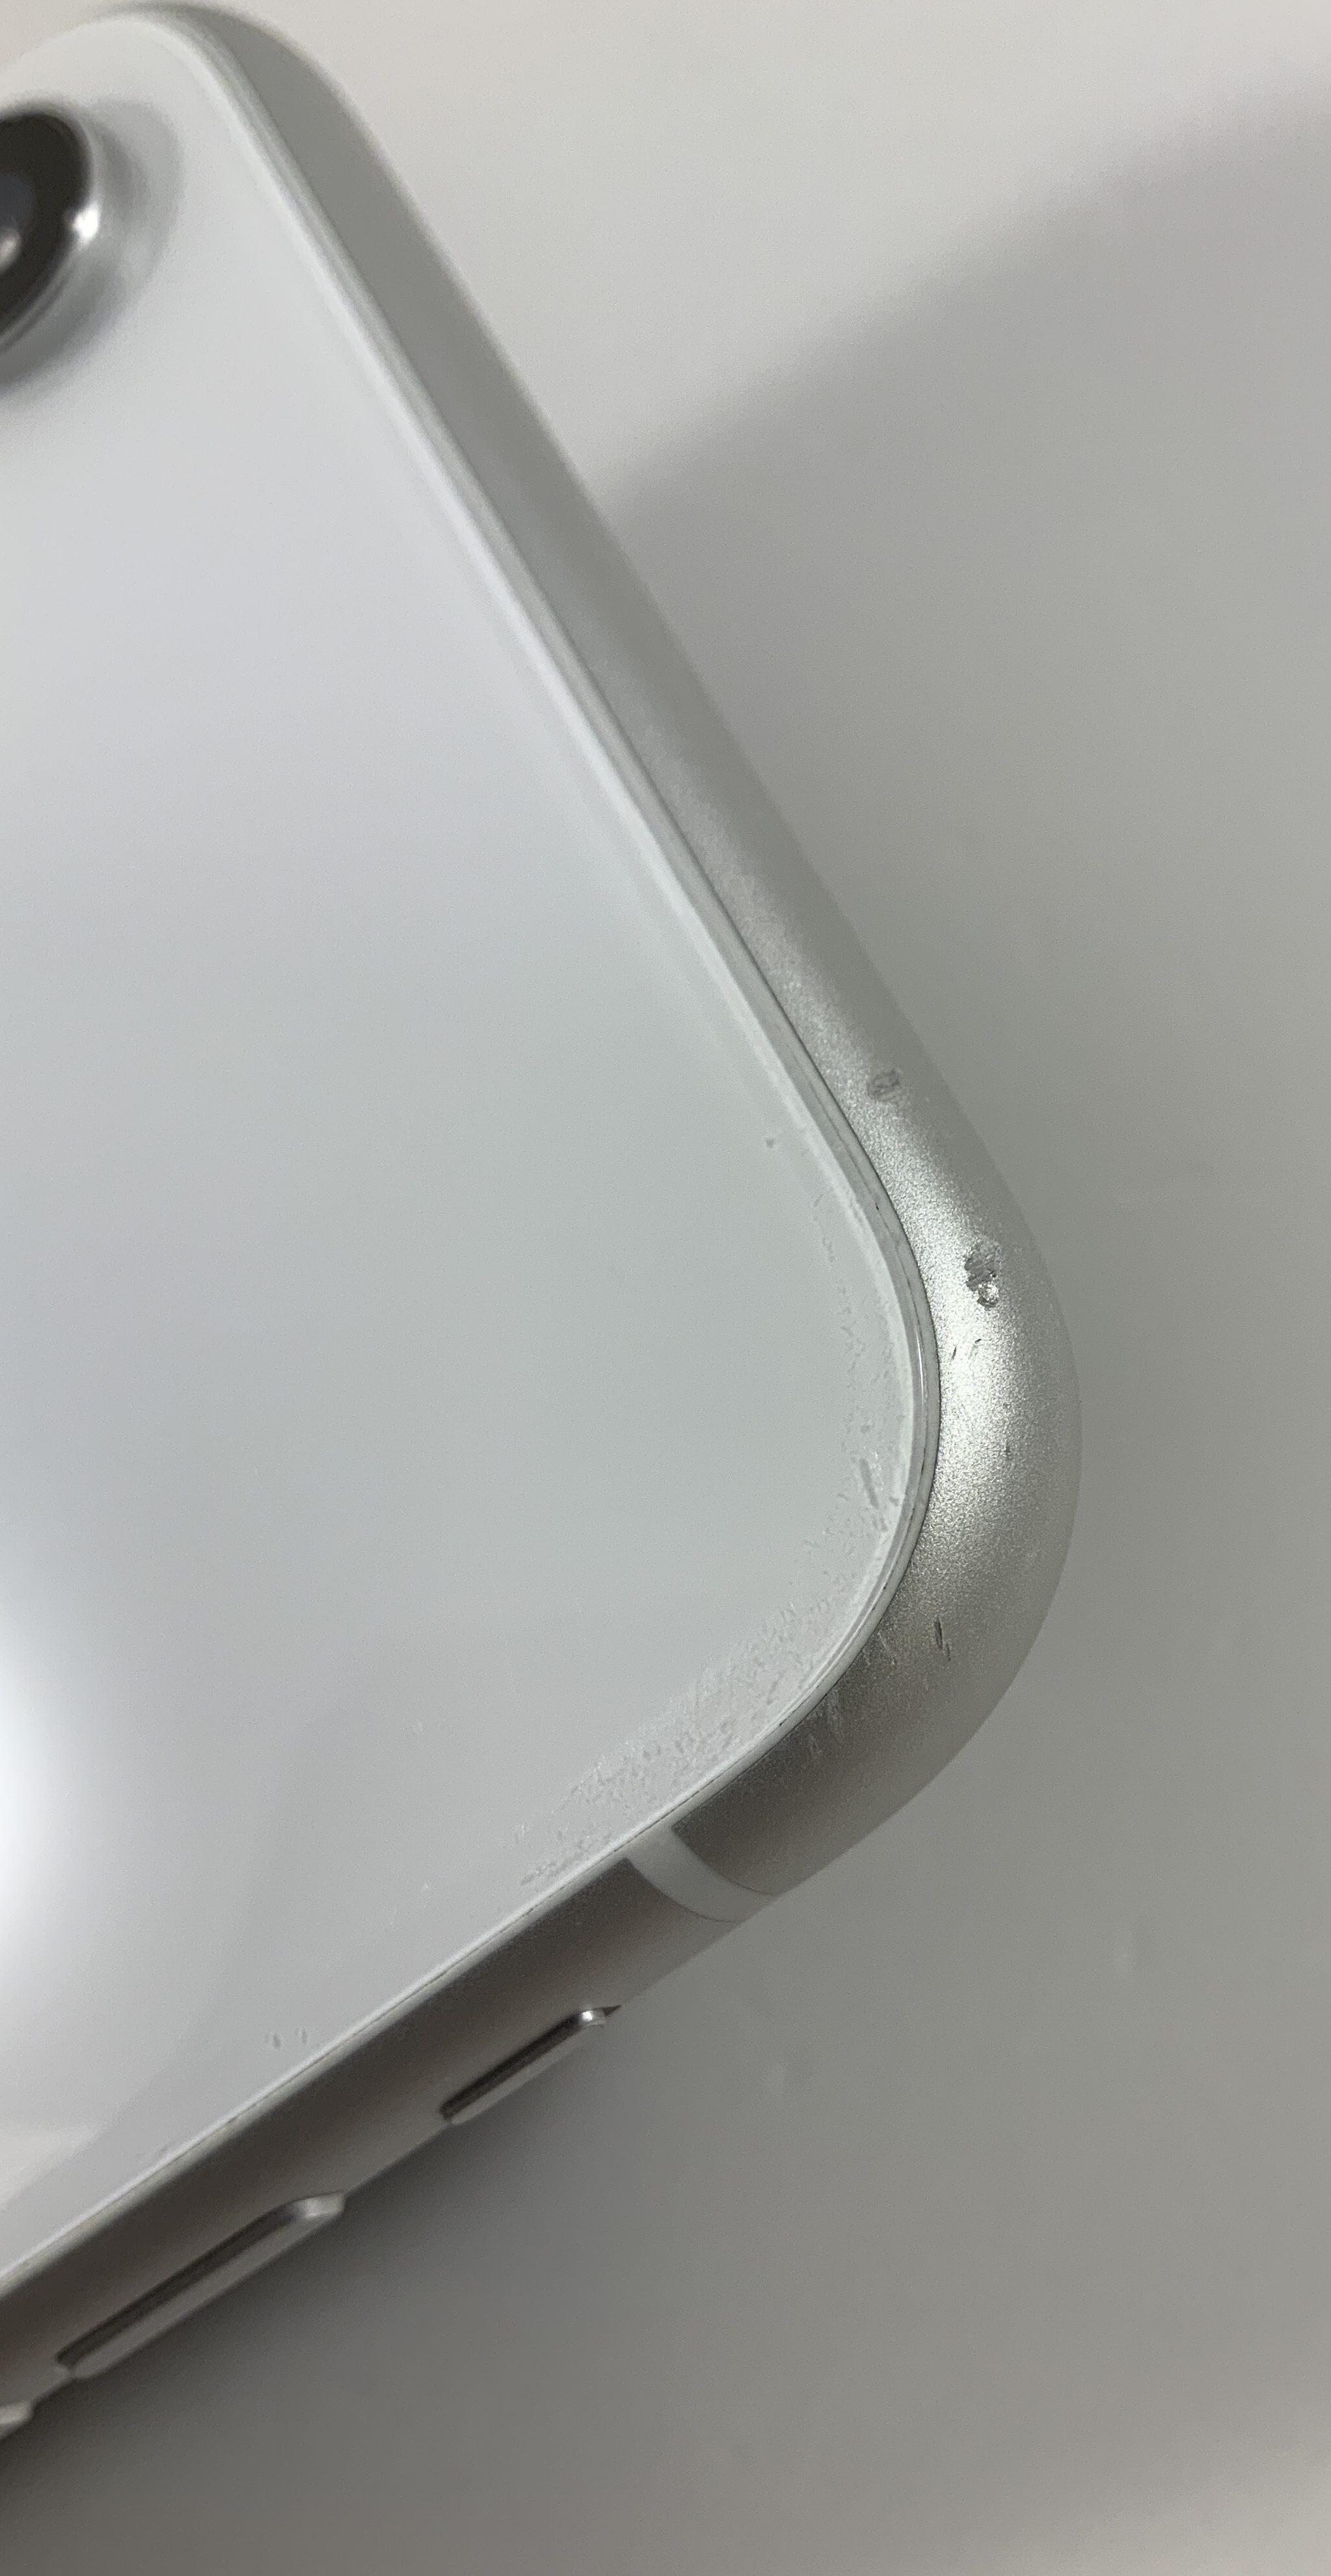 iPhone XR 128GB, 128GB, White, Bild 6